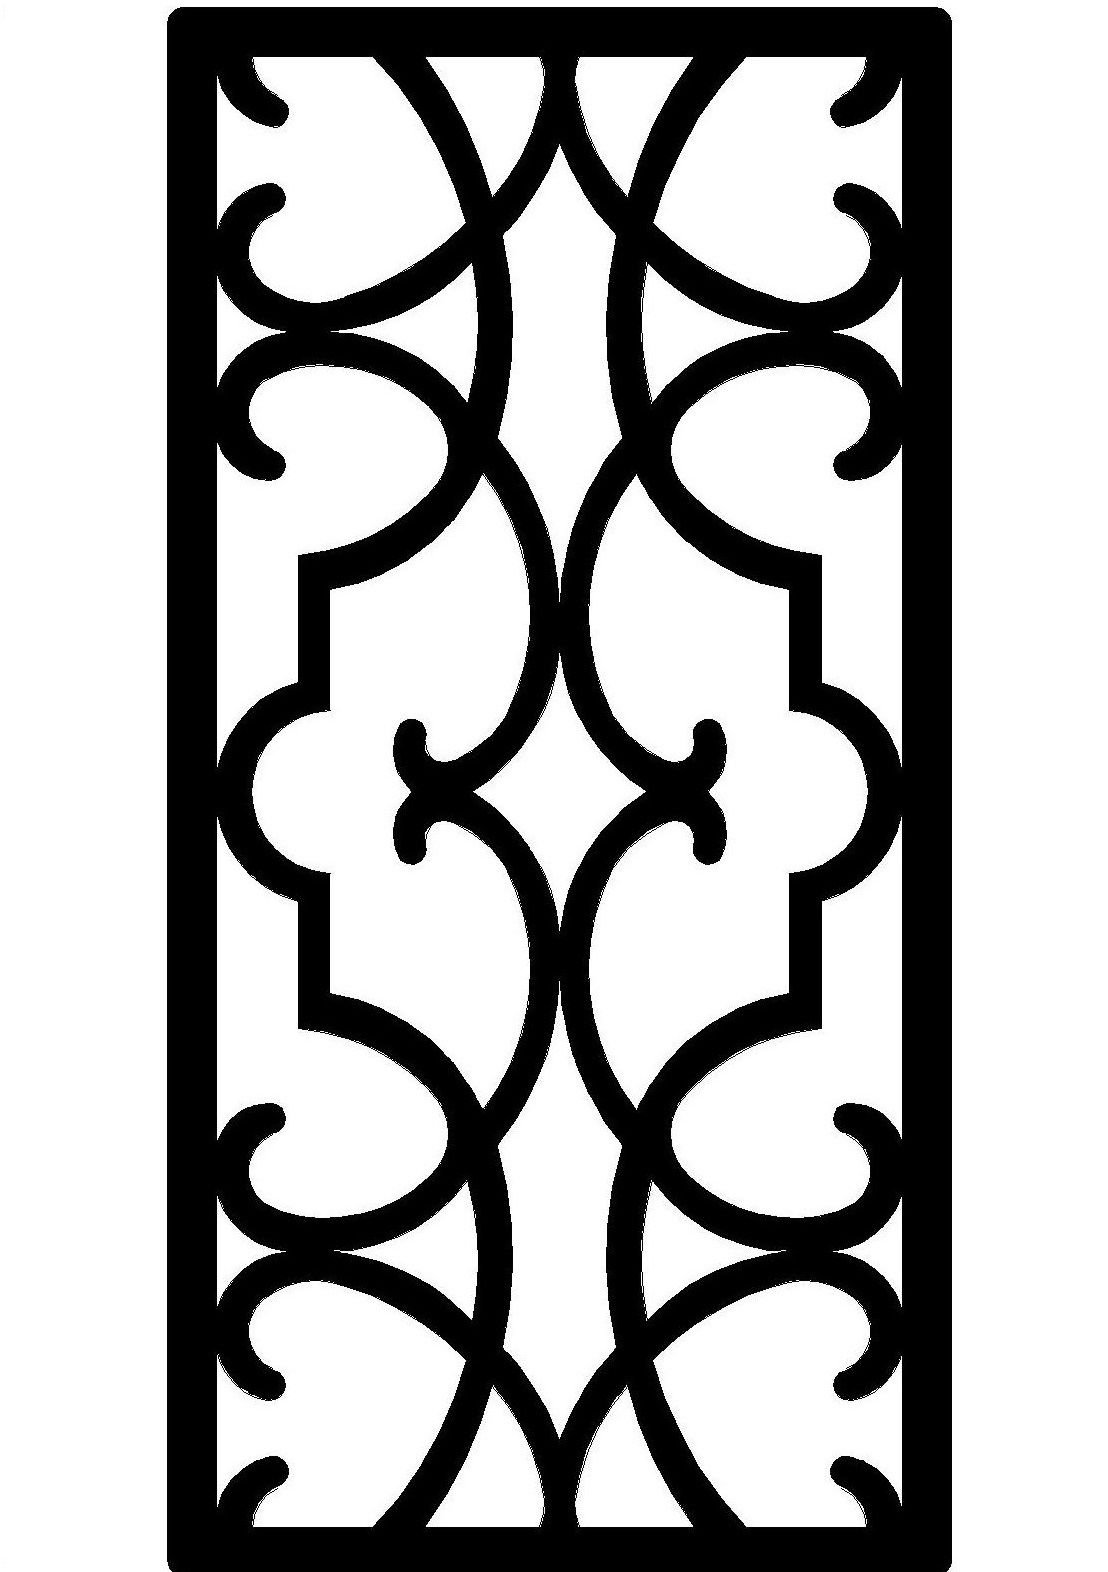 Steelcrest S Beautiful Expanded Renaissance Design